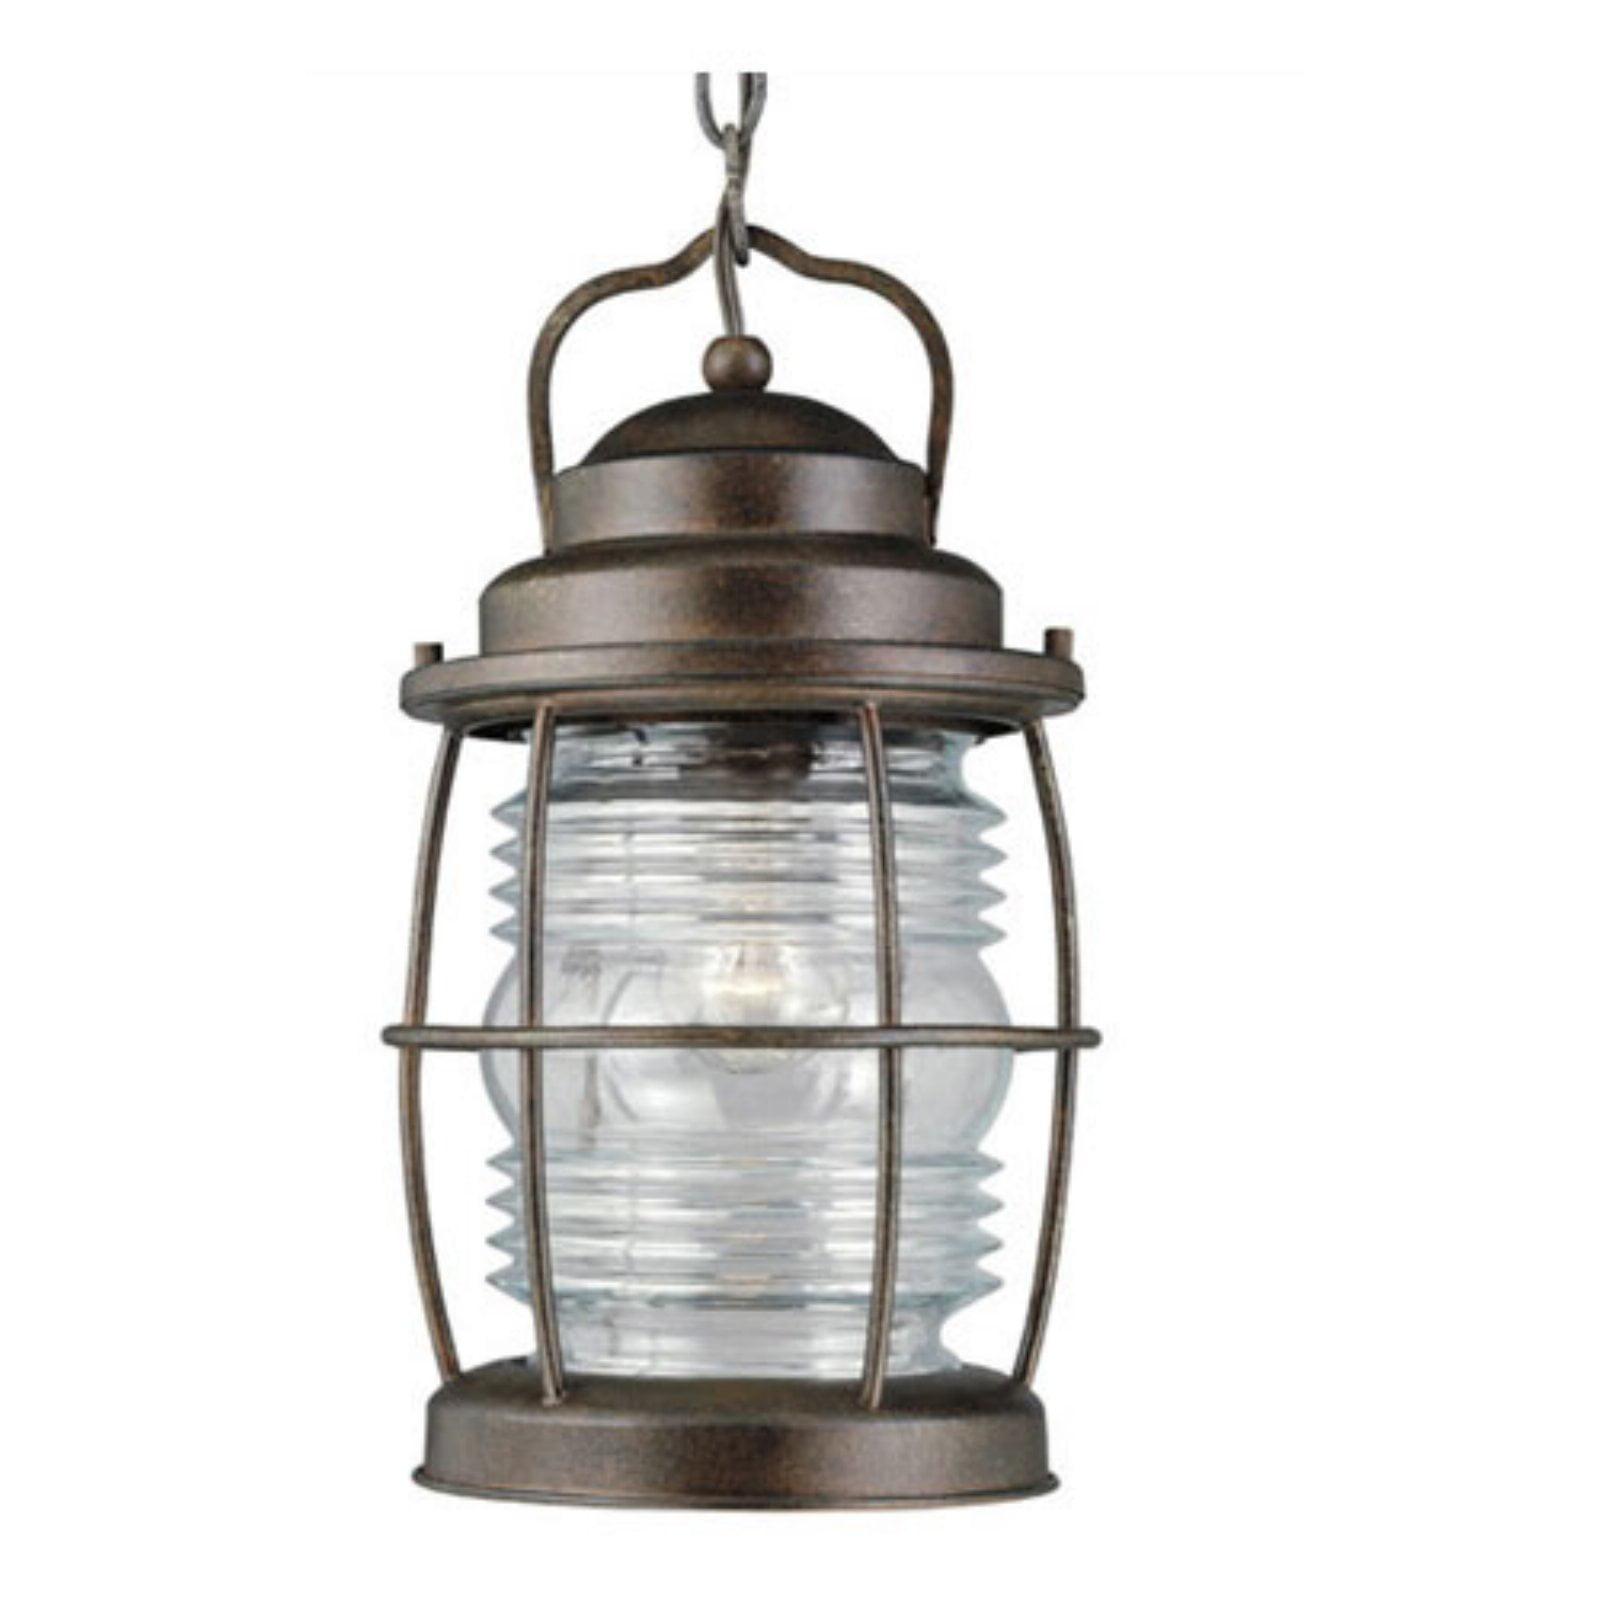 Beacon Hanging Lantern by Kenroy Home